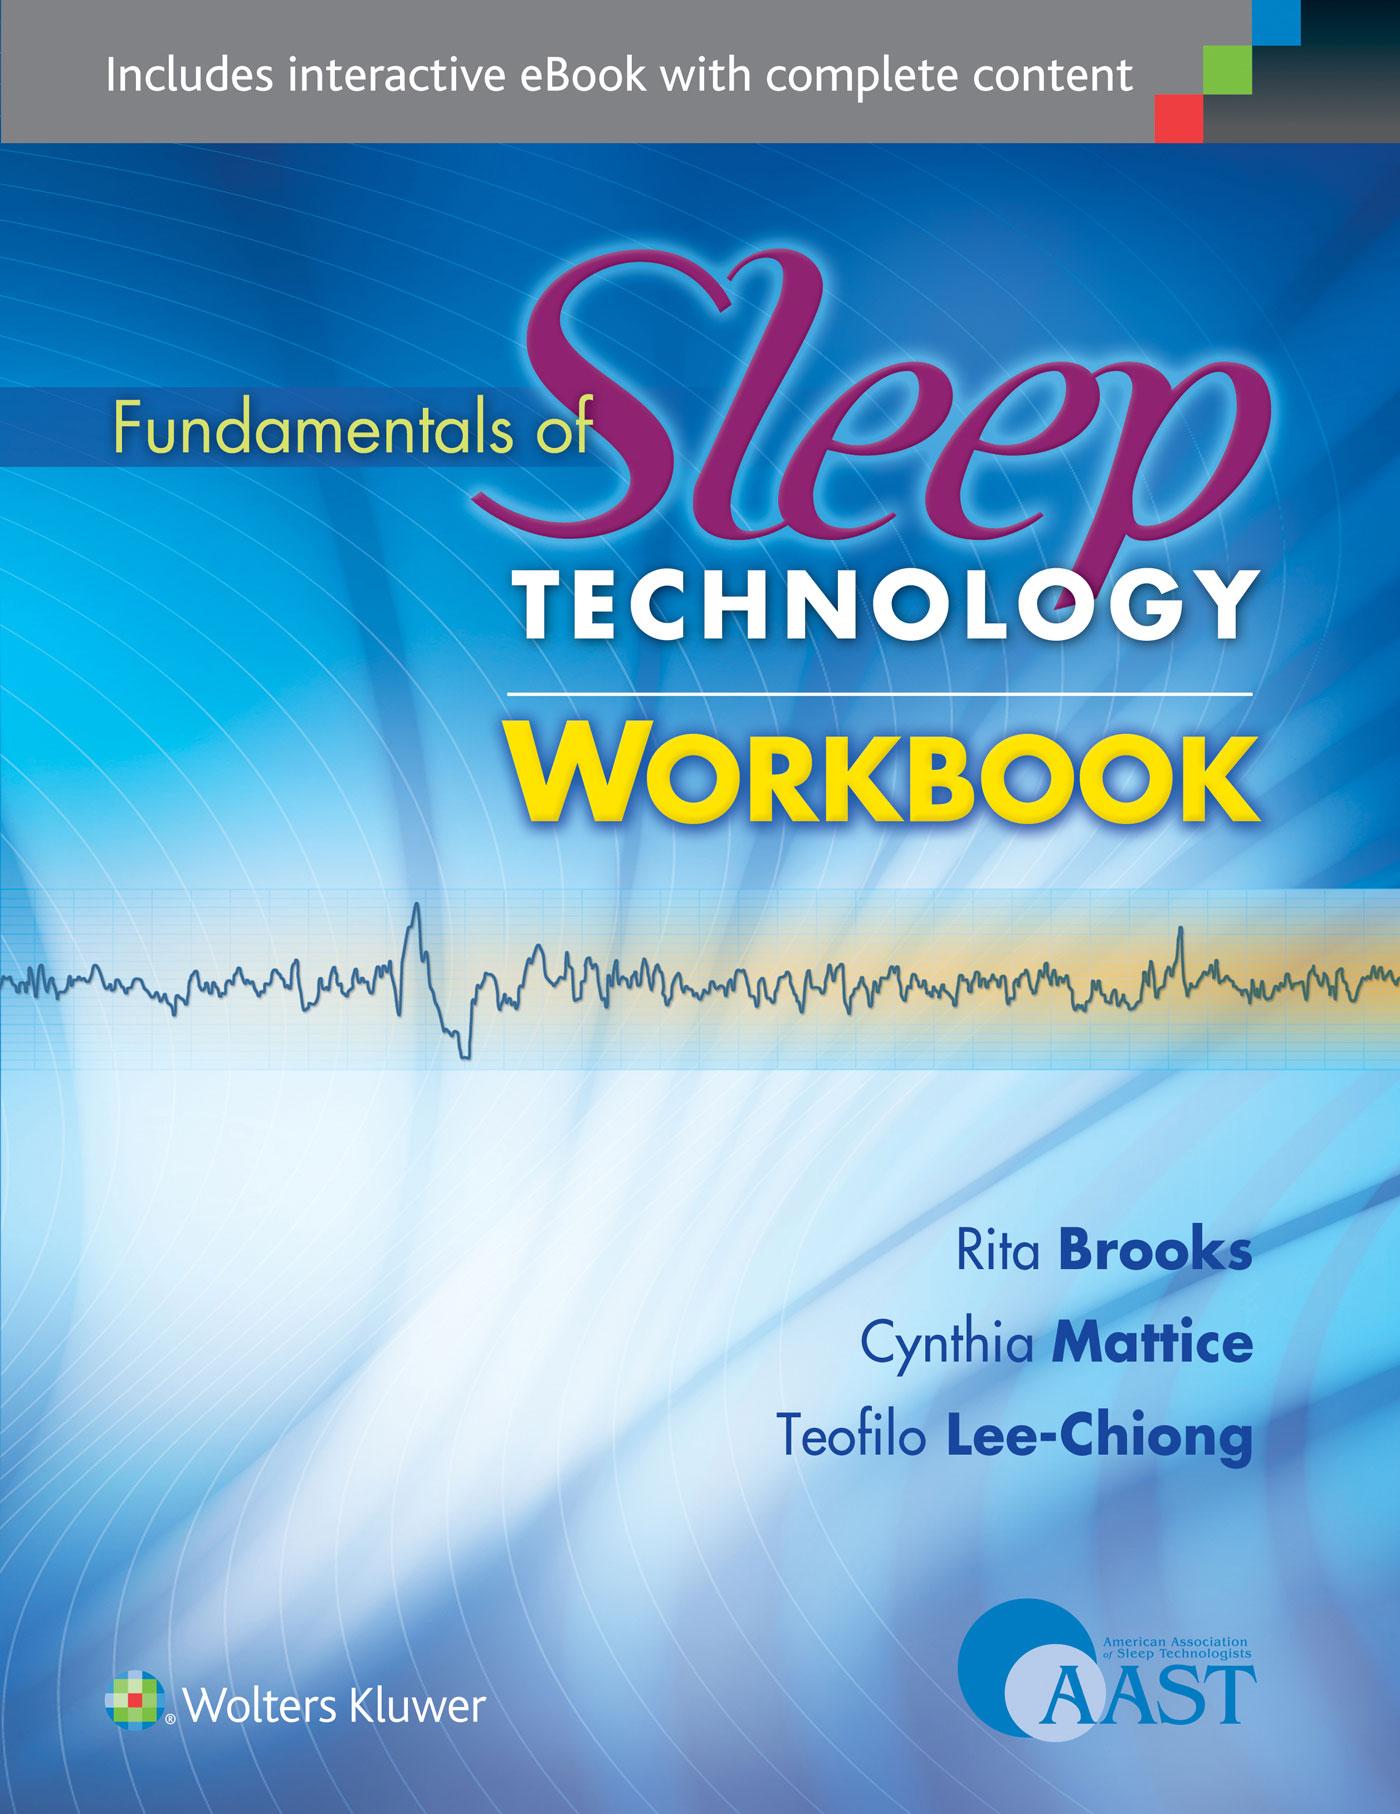 Fundamentals of sleep technology workbook fandeluxe Image collections